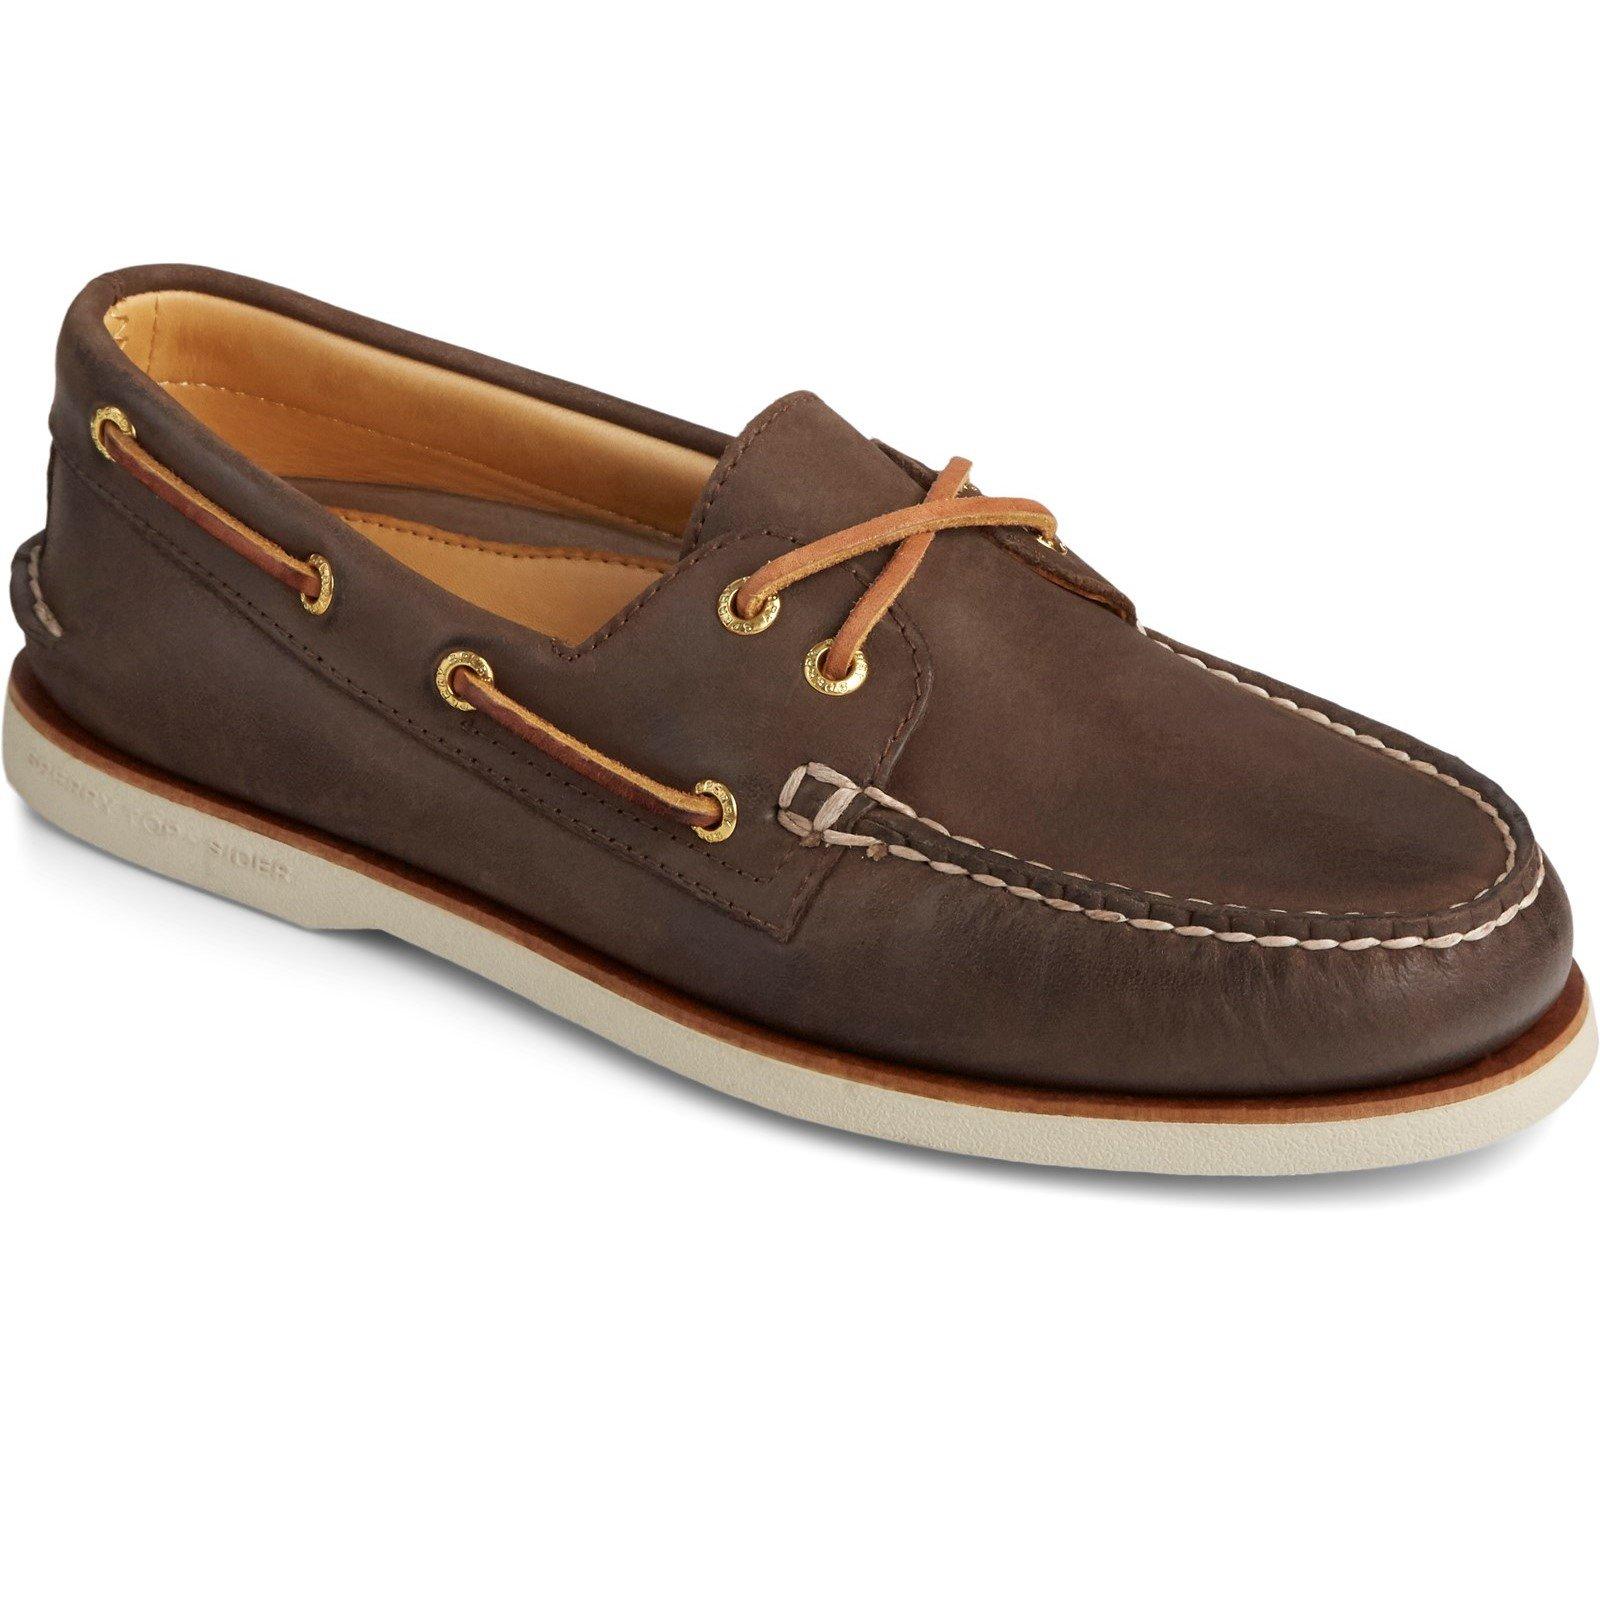 Sperry Men's Cup Authentic Original Boat Shoe Various Colours 31735 - Brown 7